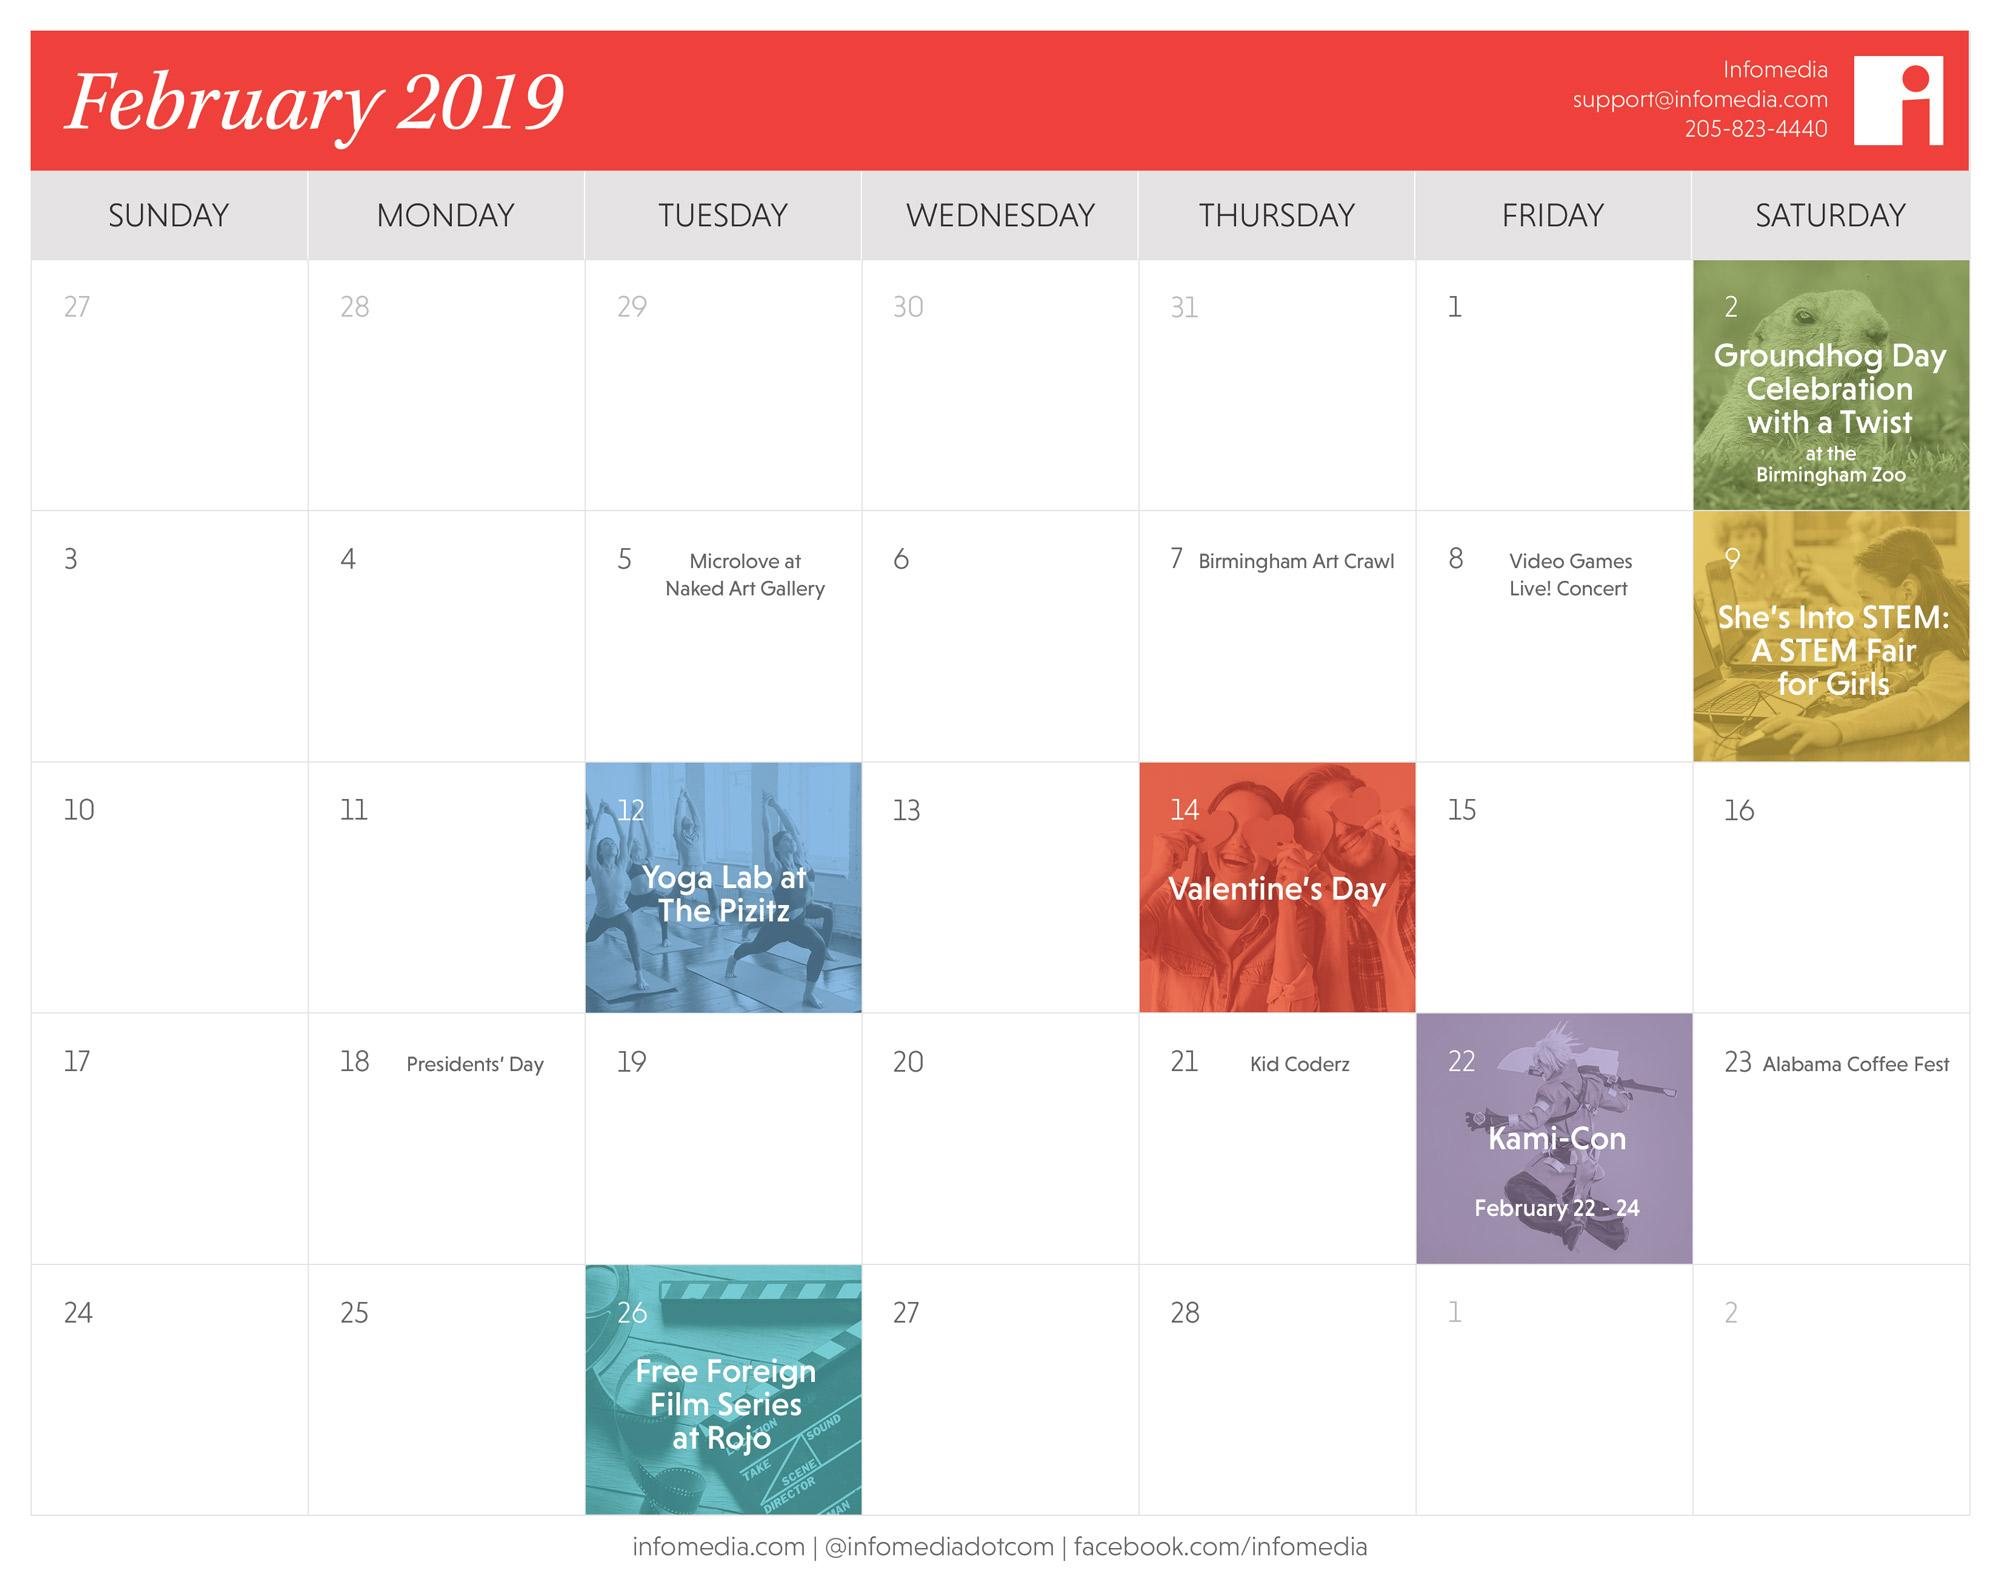 Our Free February 2019 Birmingham Calendar is Here